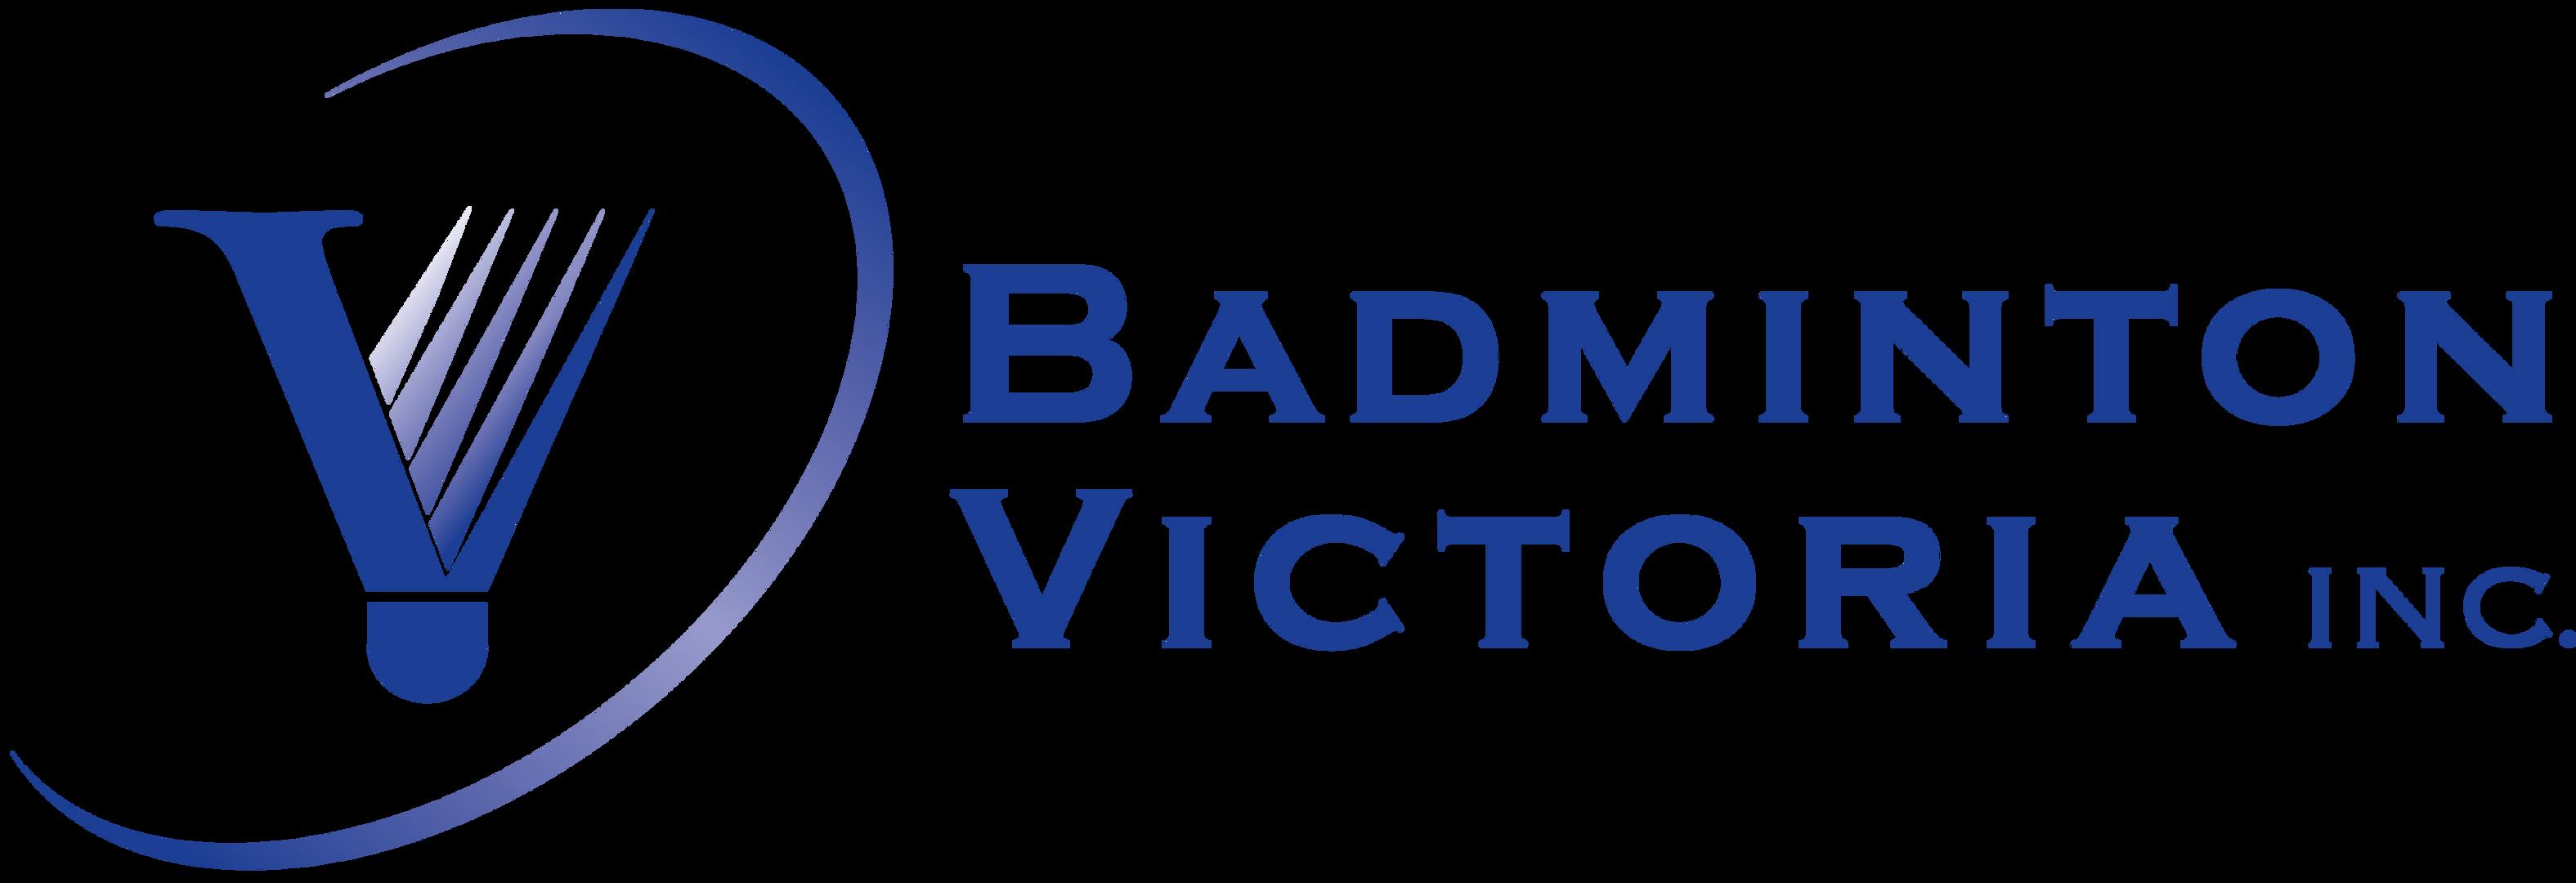 Badminton Victoria Logo - Horizontal - P